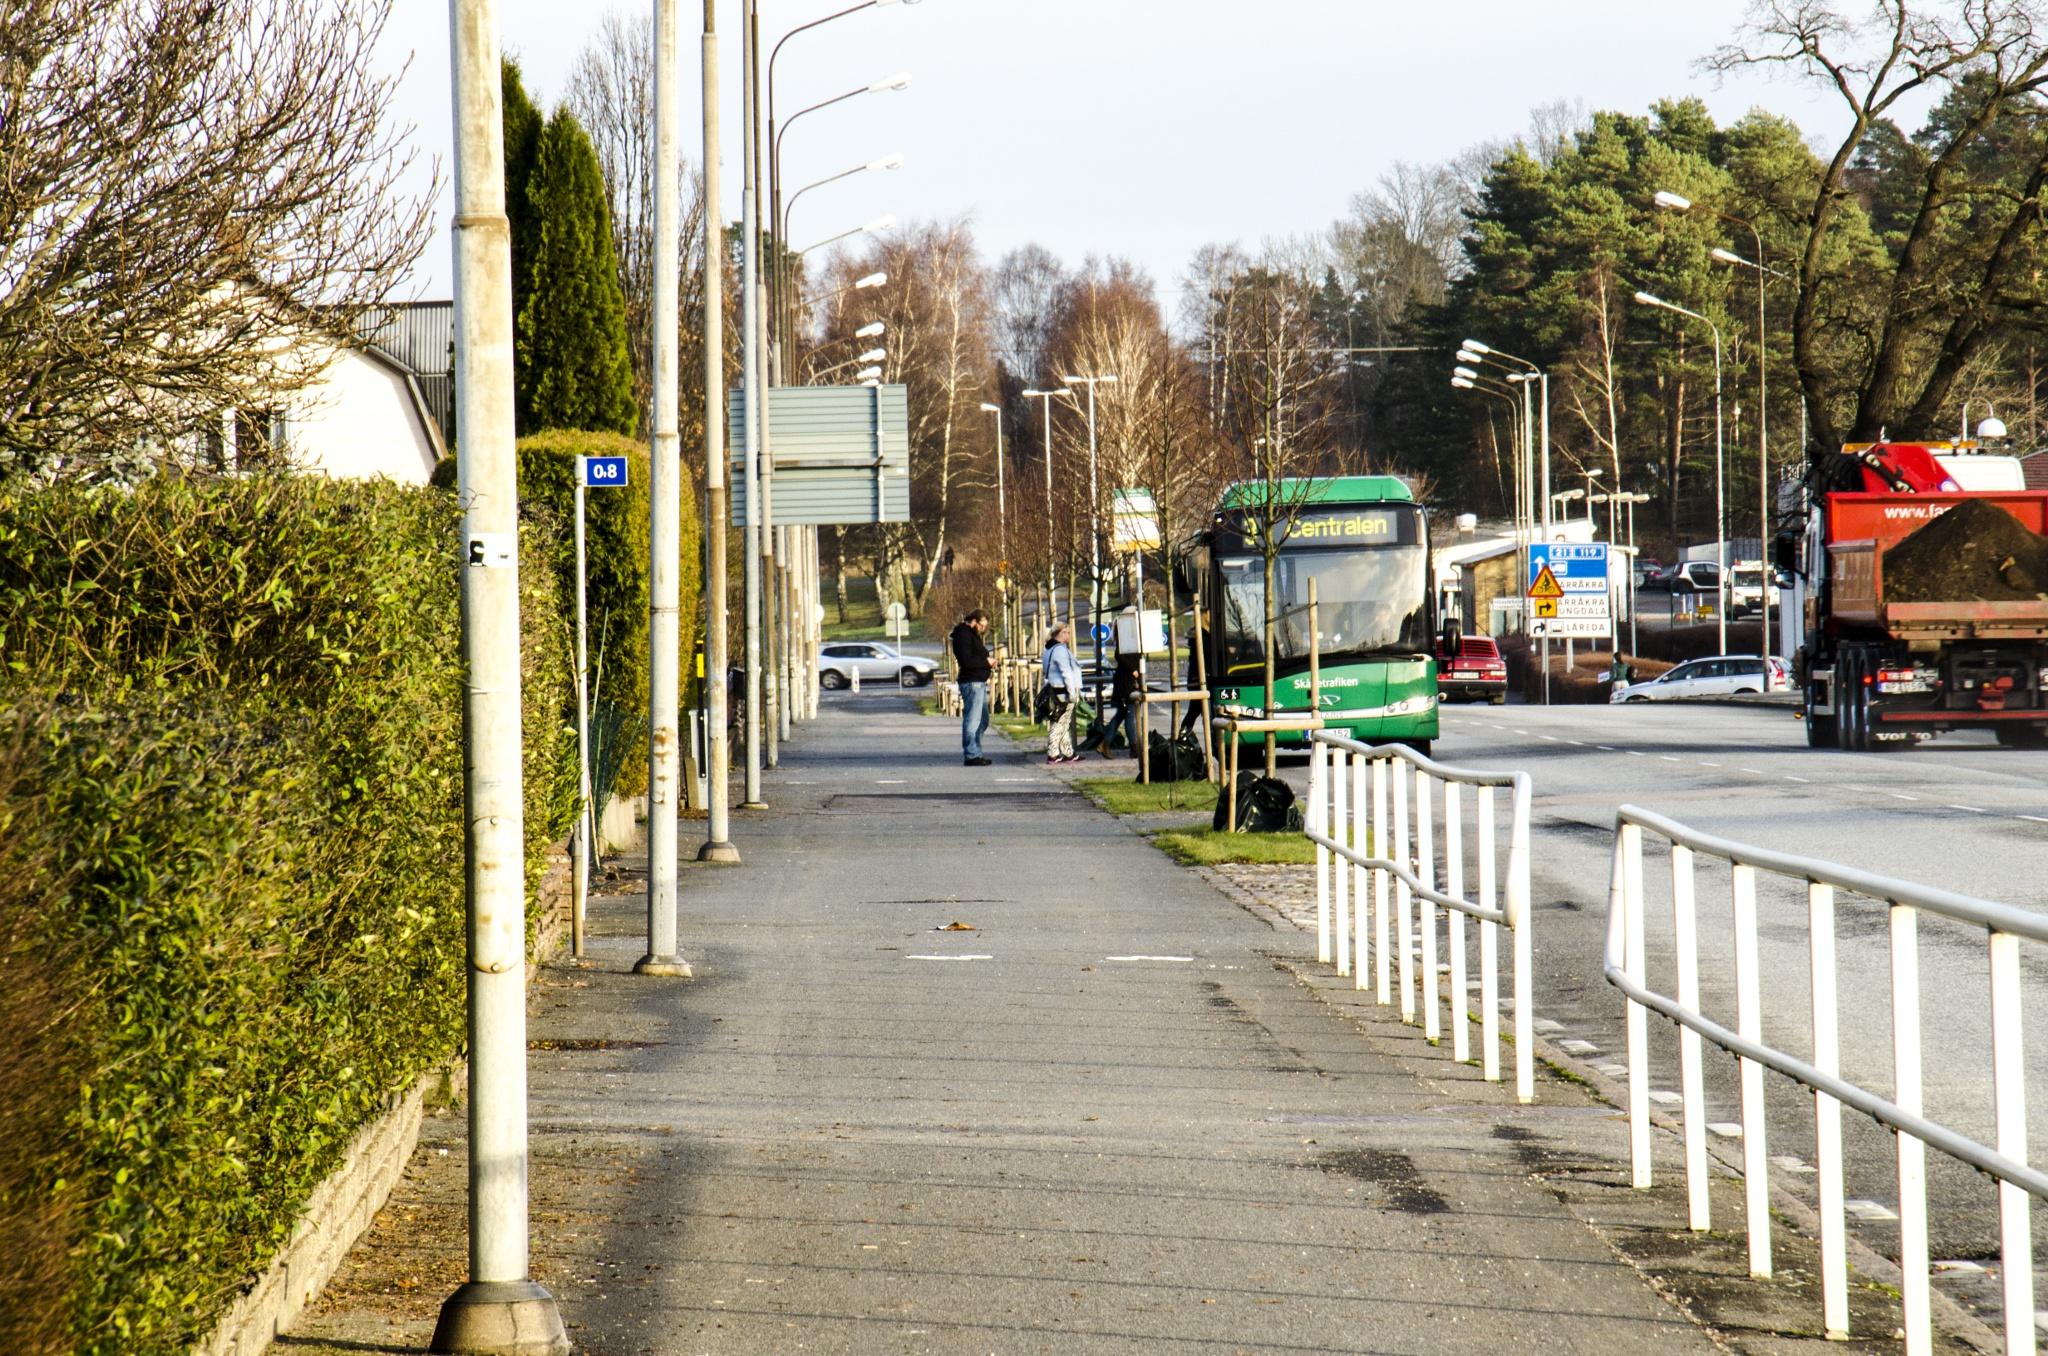 Hässleholm a Monday morning by Johnny Lythell